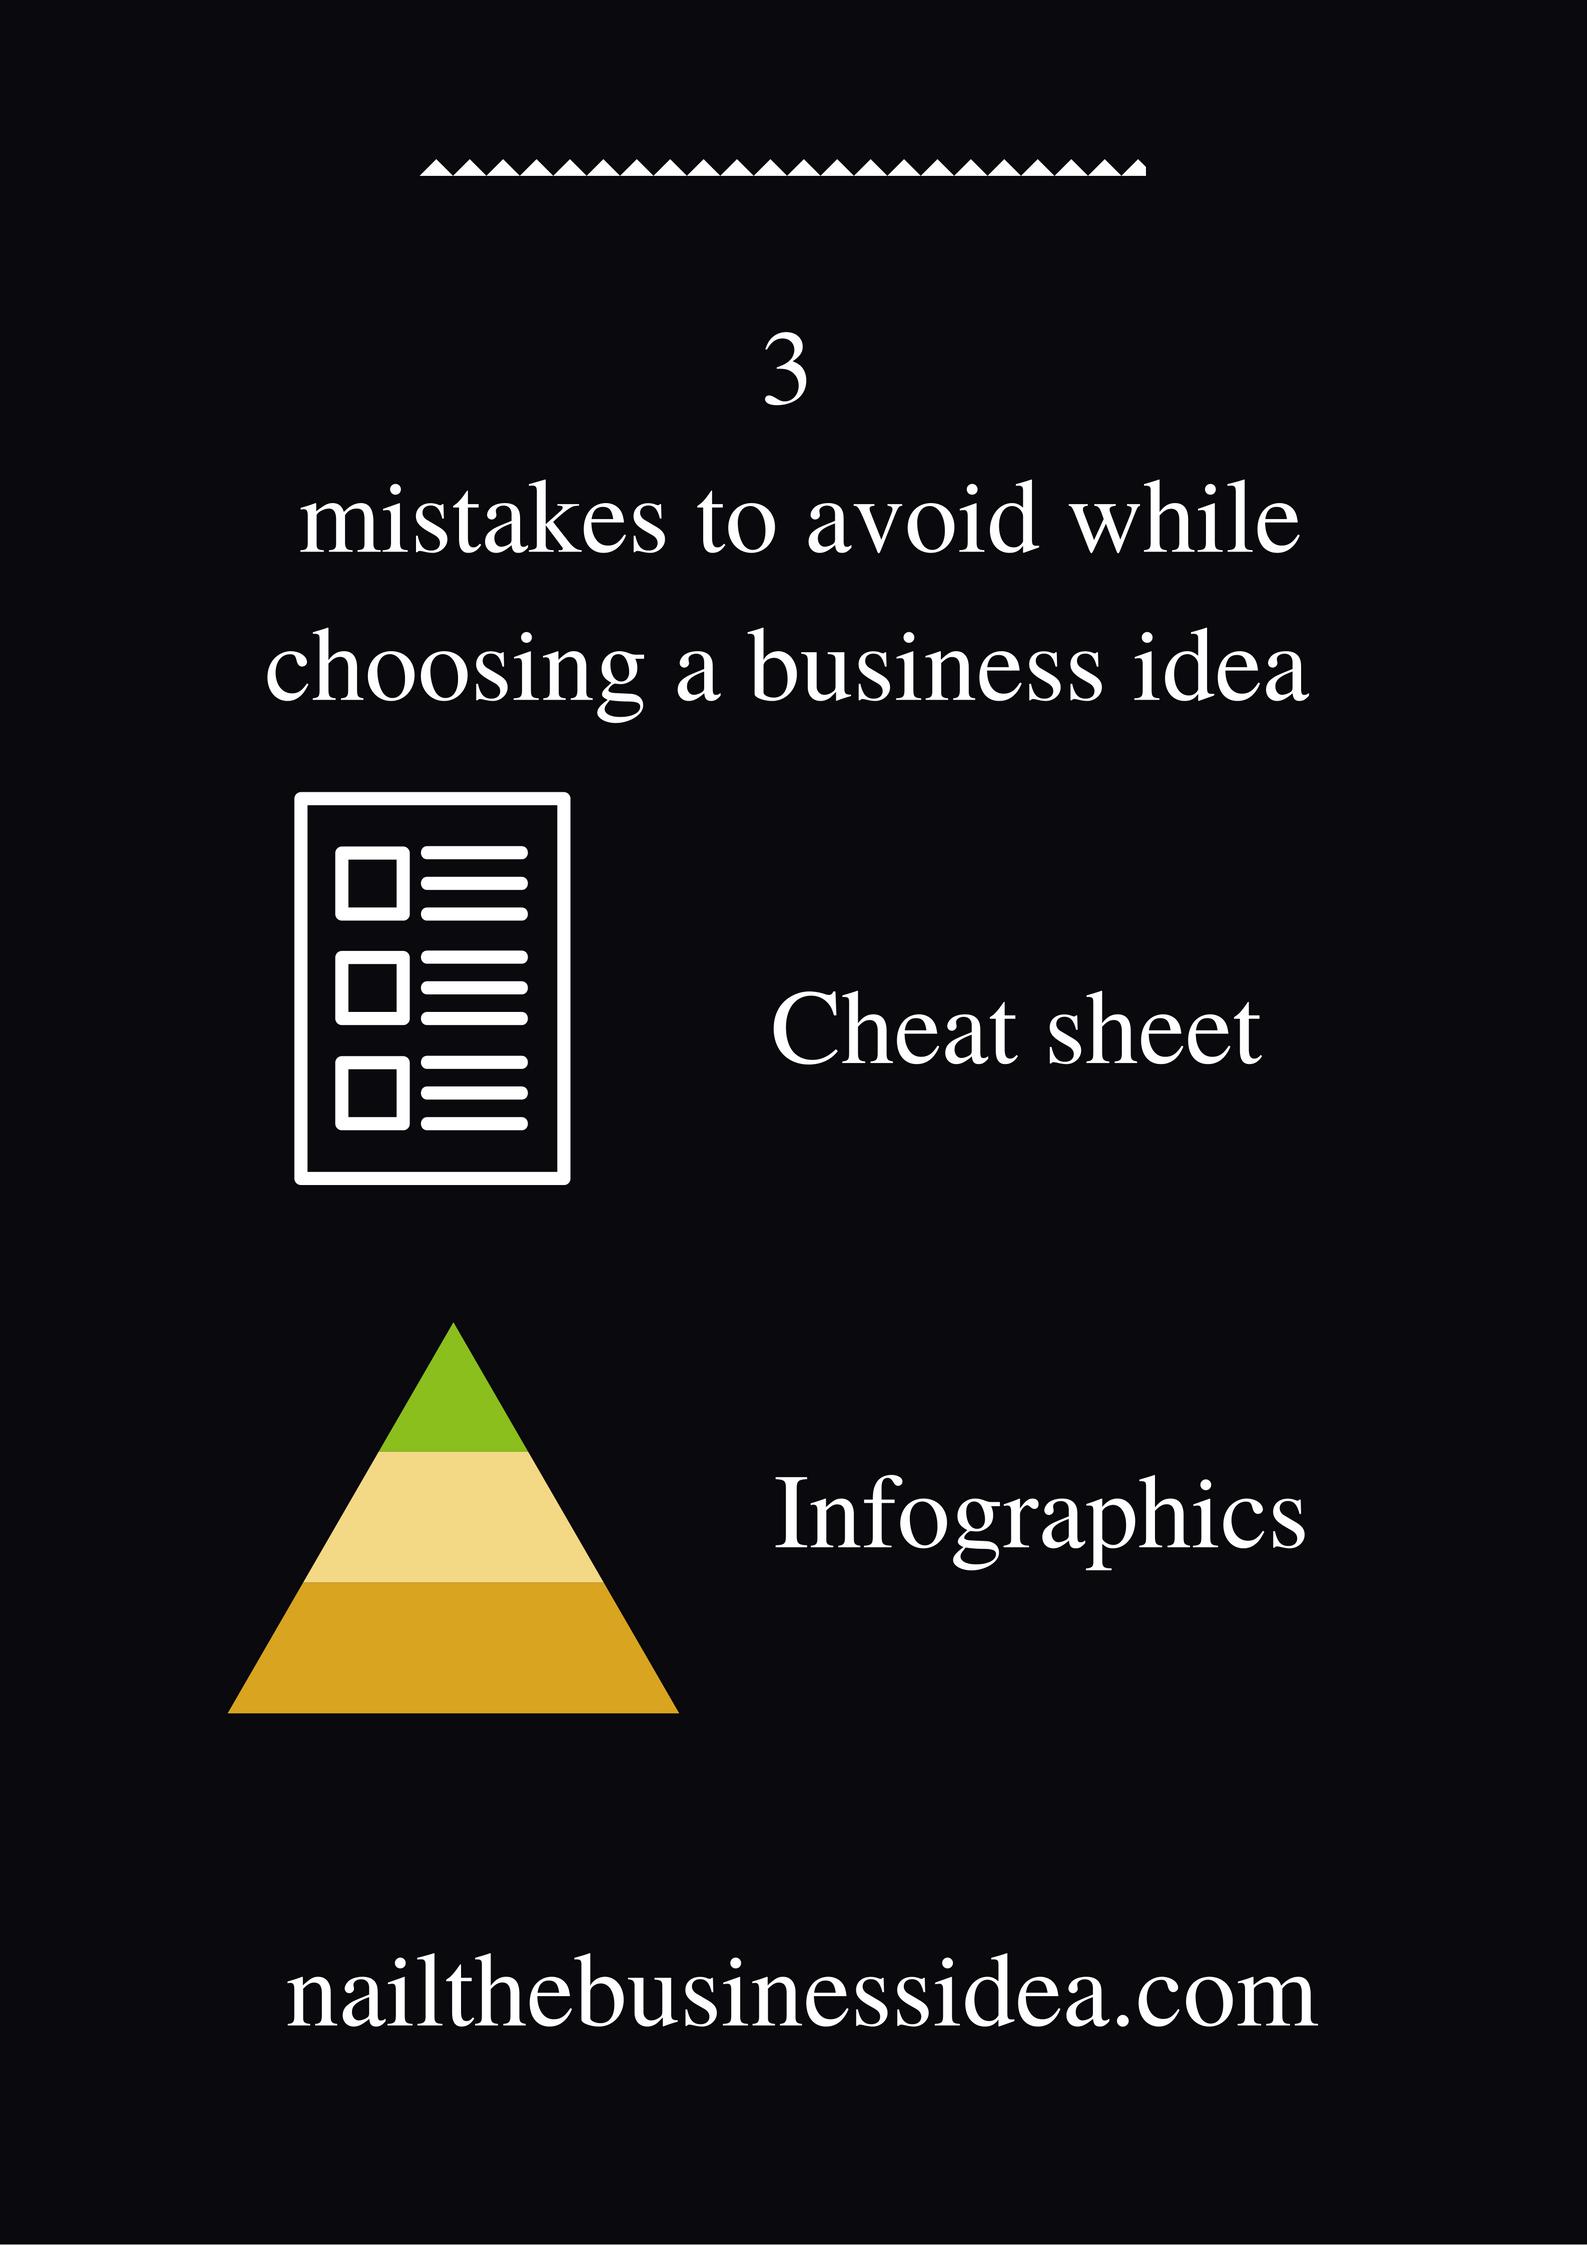 3 business idea mistakes to avoid: Nail the business idea